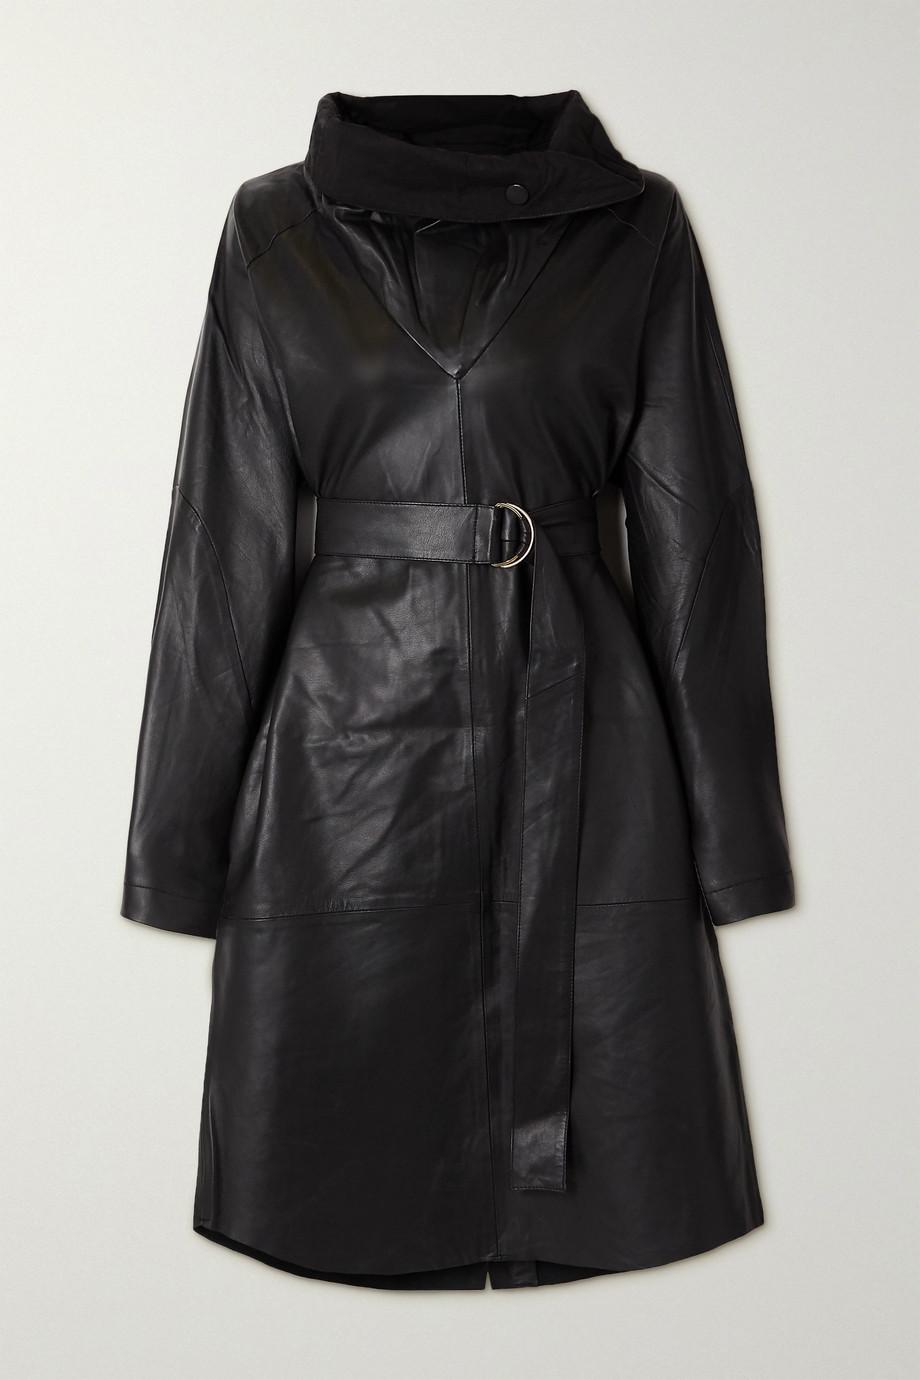 REMAIN Birger Christensen Sortie belted leather dress